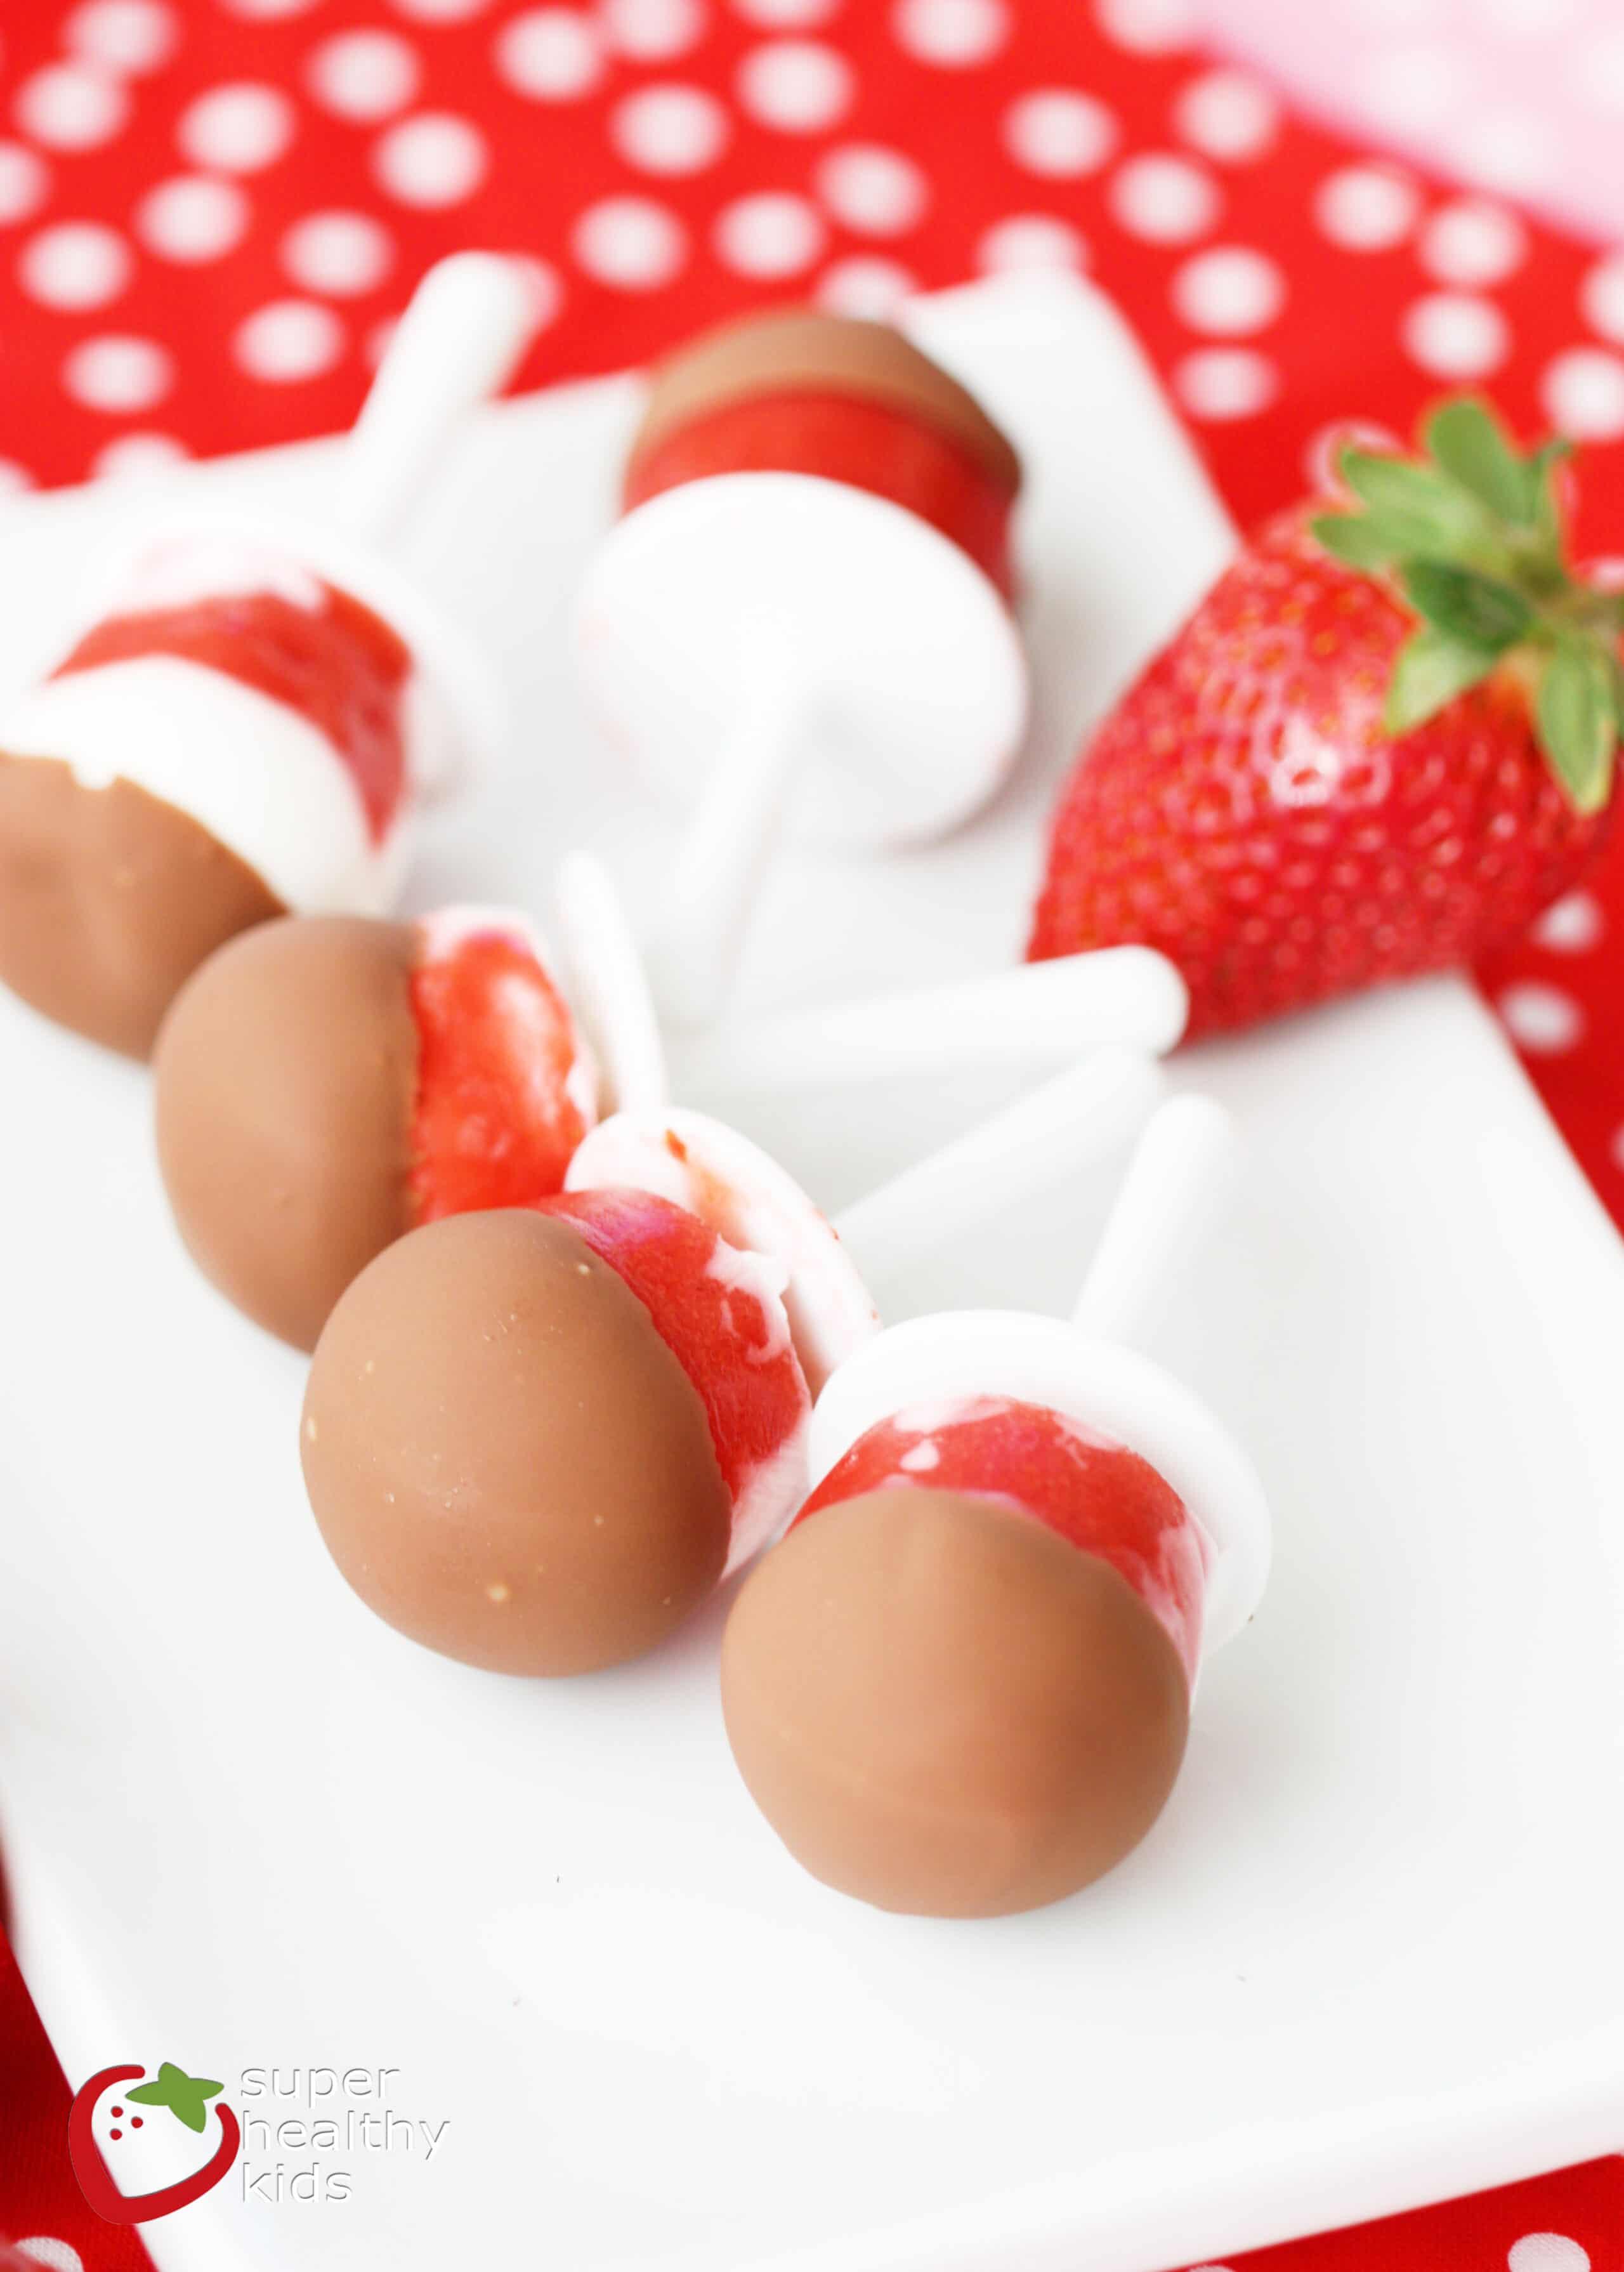 Strawberries and Cream Choco Pops 1